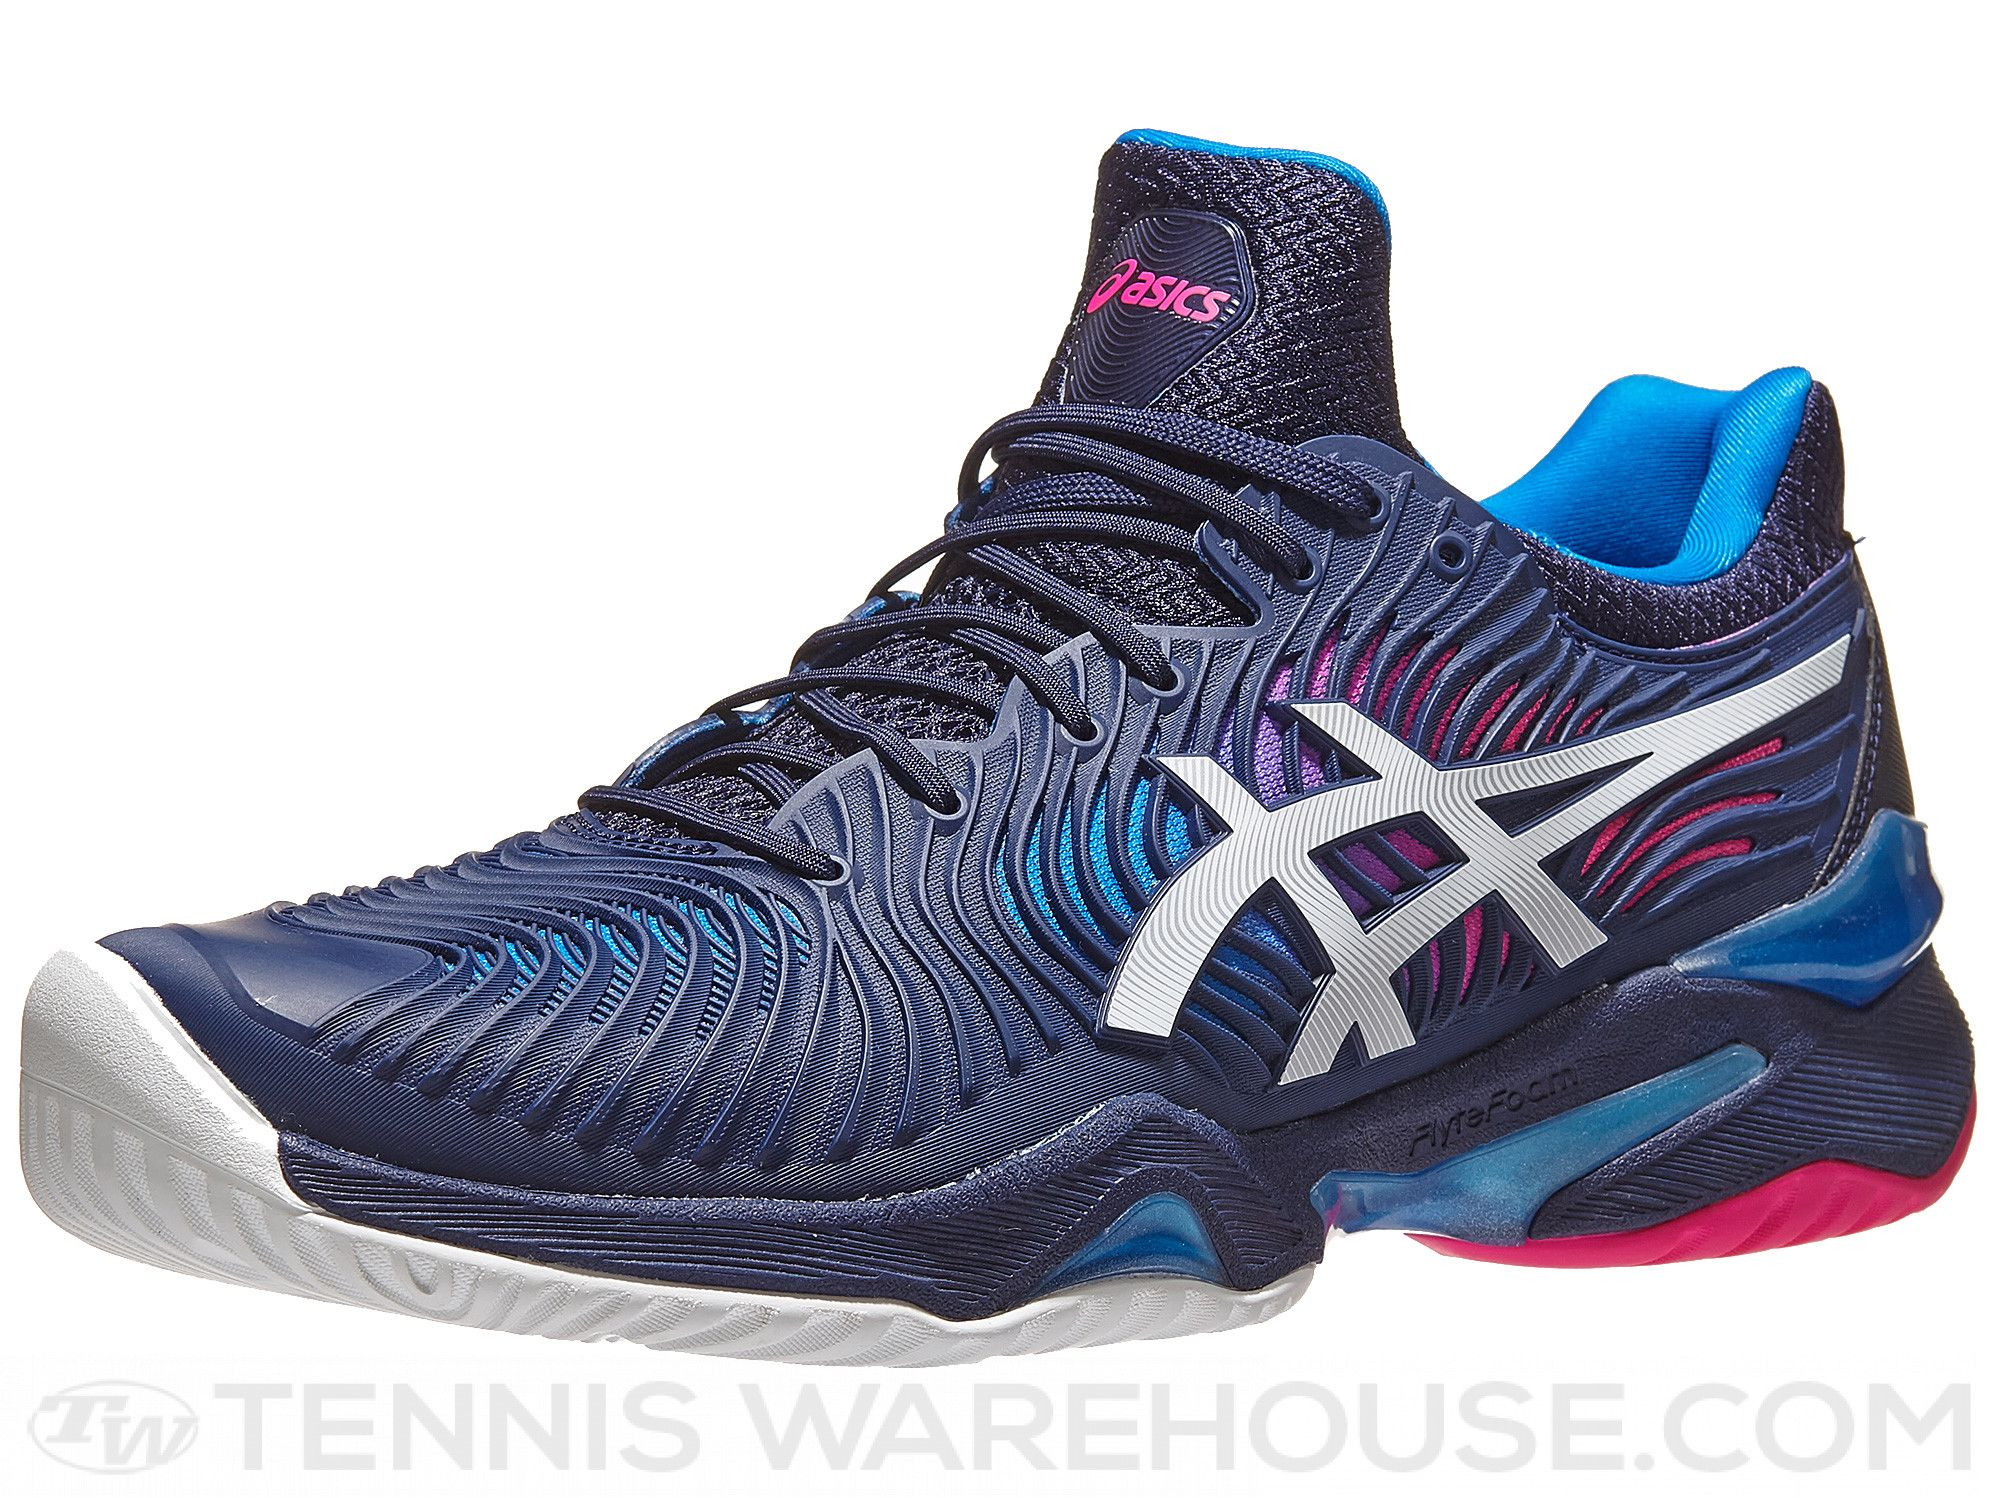 Asics Court FF 2 Blue/Pink/White Women's Shoes | Fashion ...